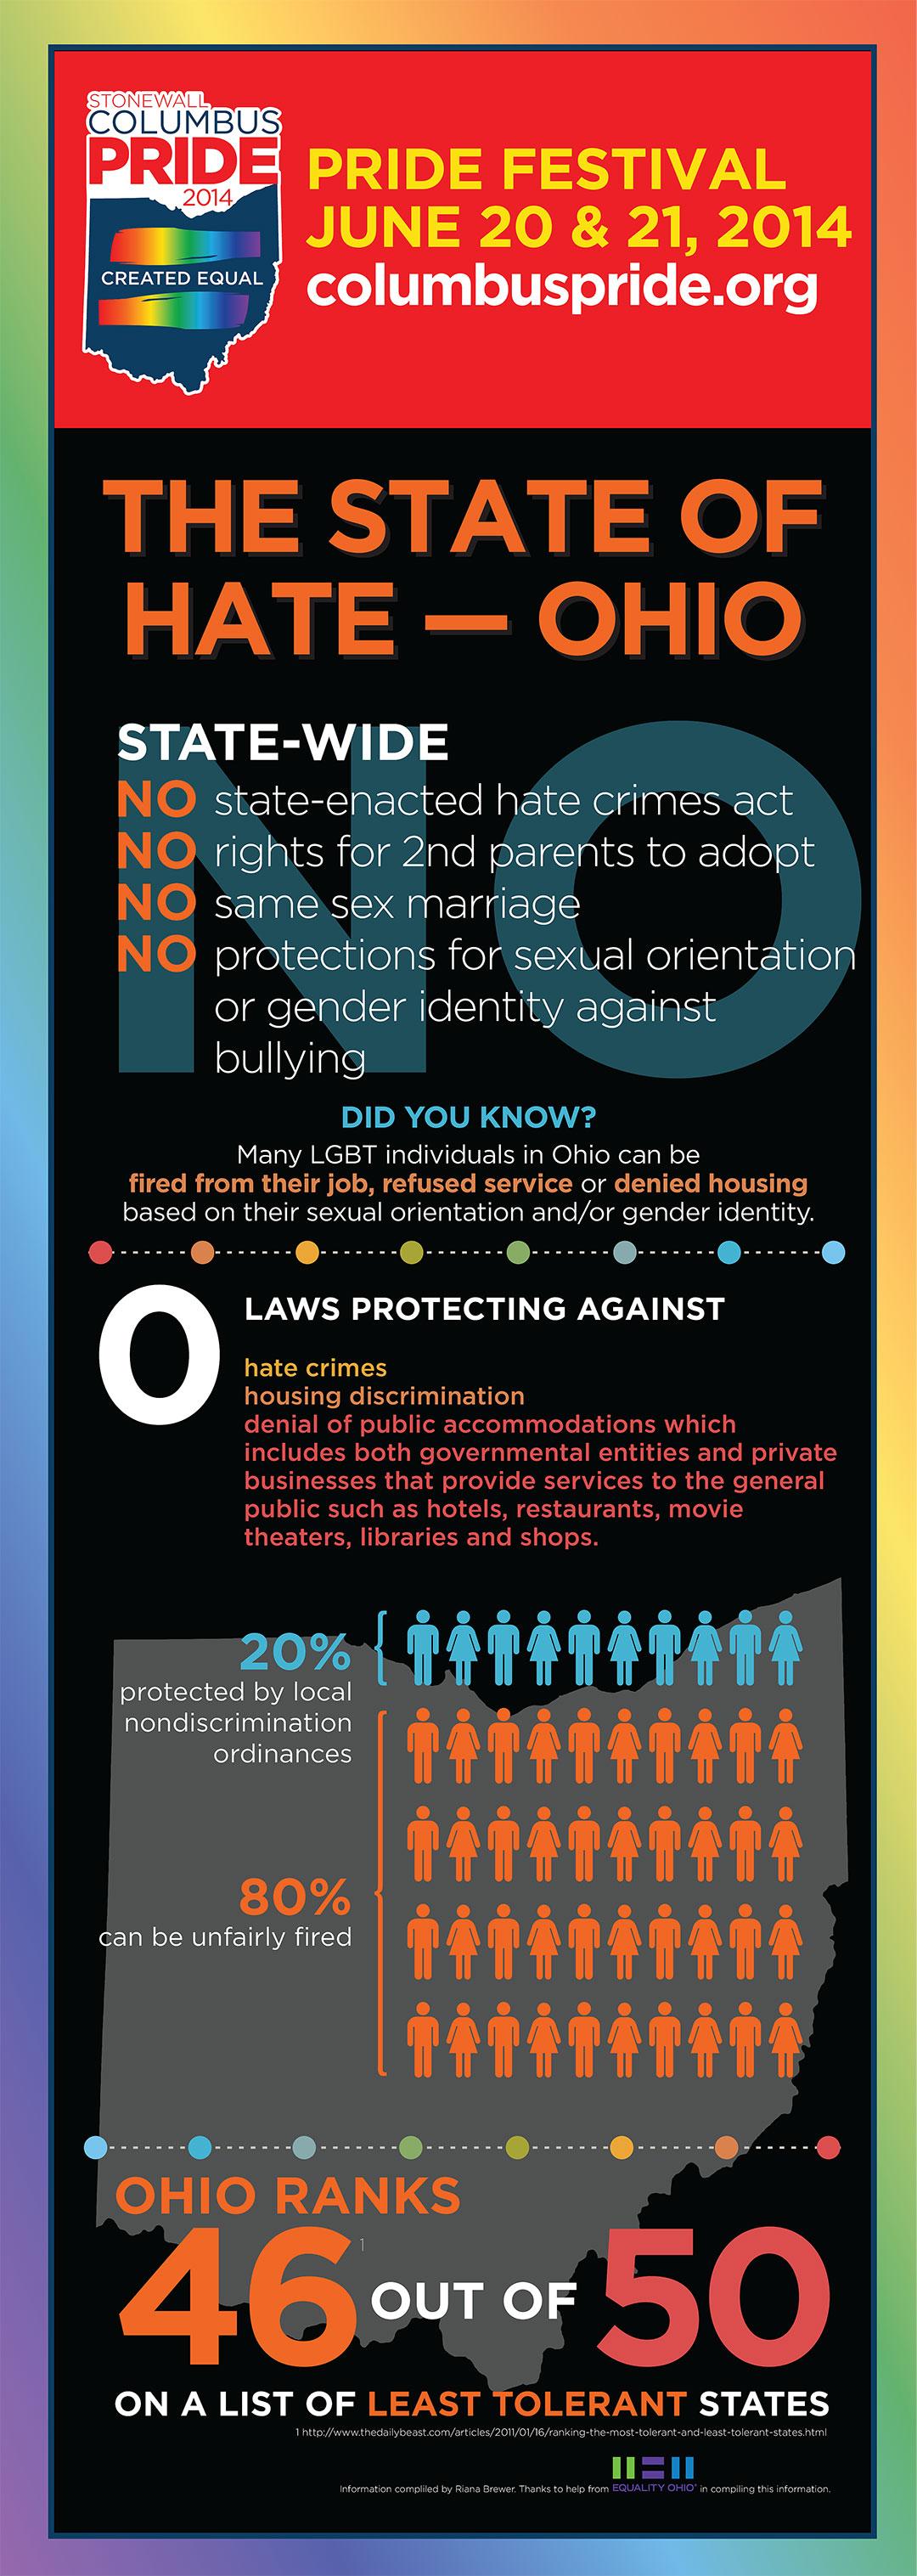 Stonewall Columbus Pride 2014: Hate in Ohio Infographic